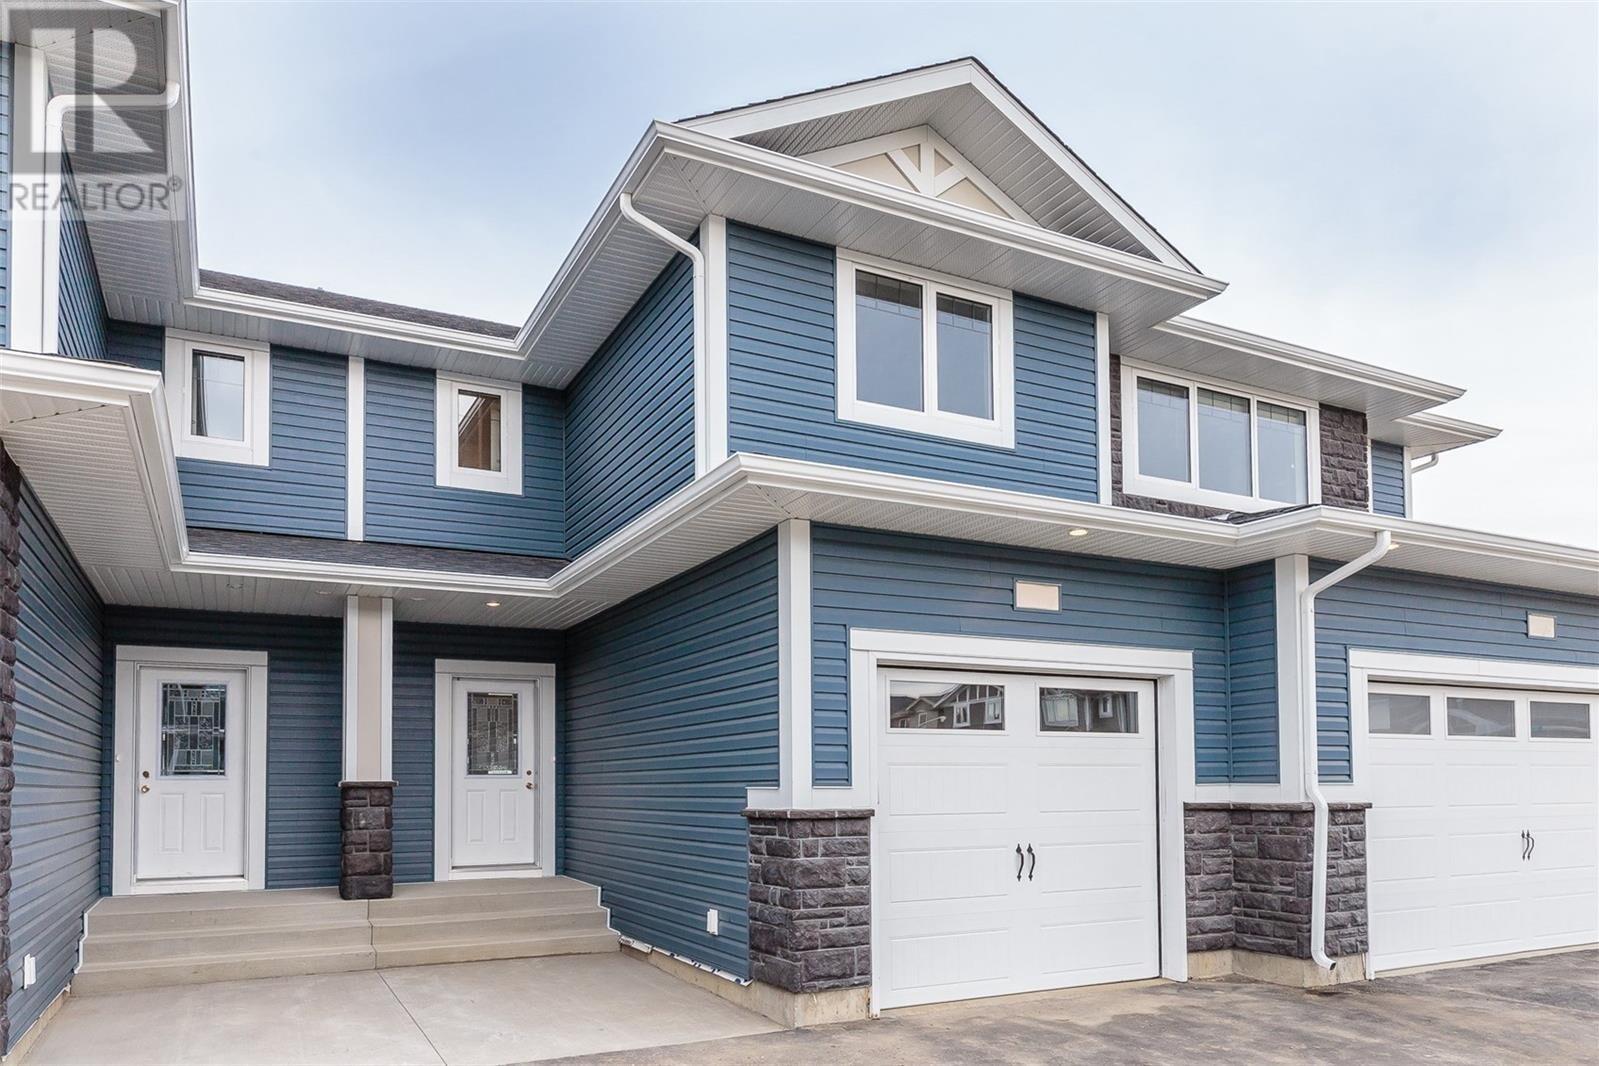 Townhouse for sale at 115 Veltkamp Cres Unit 52 Saskatoon Saskatchewan - MLS: SK808873